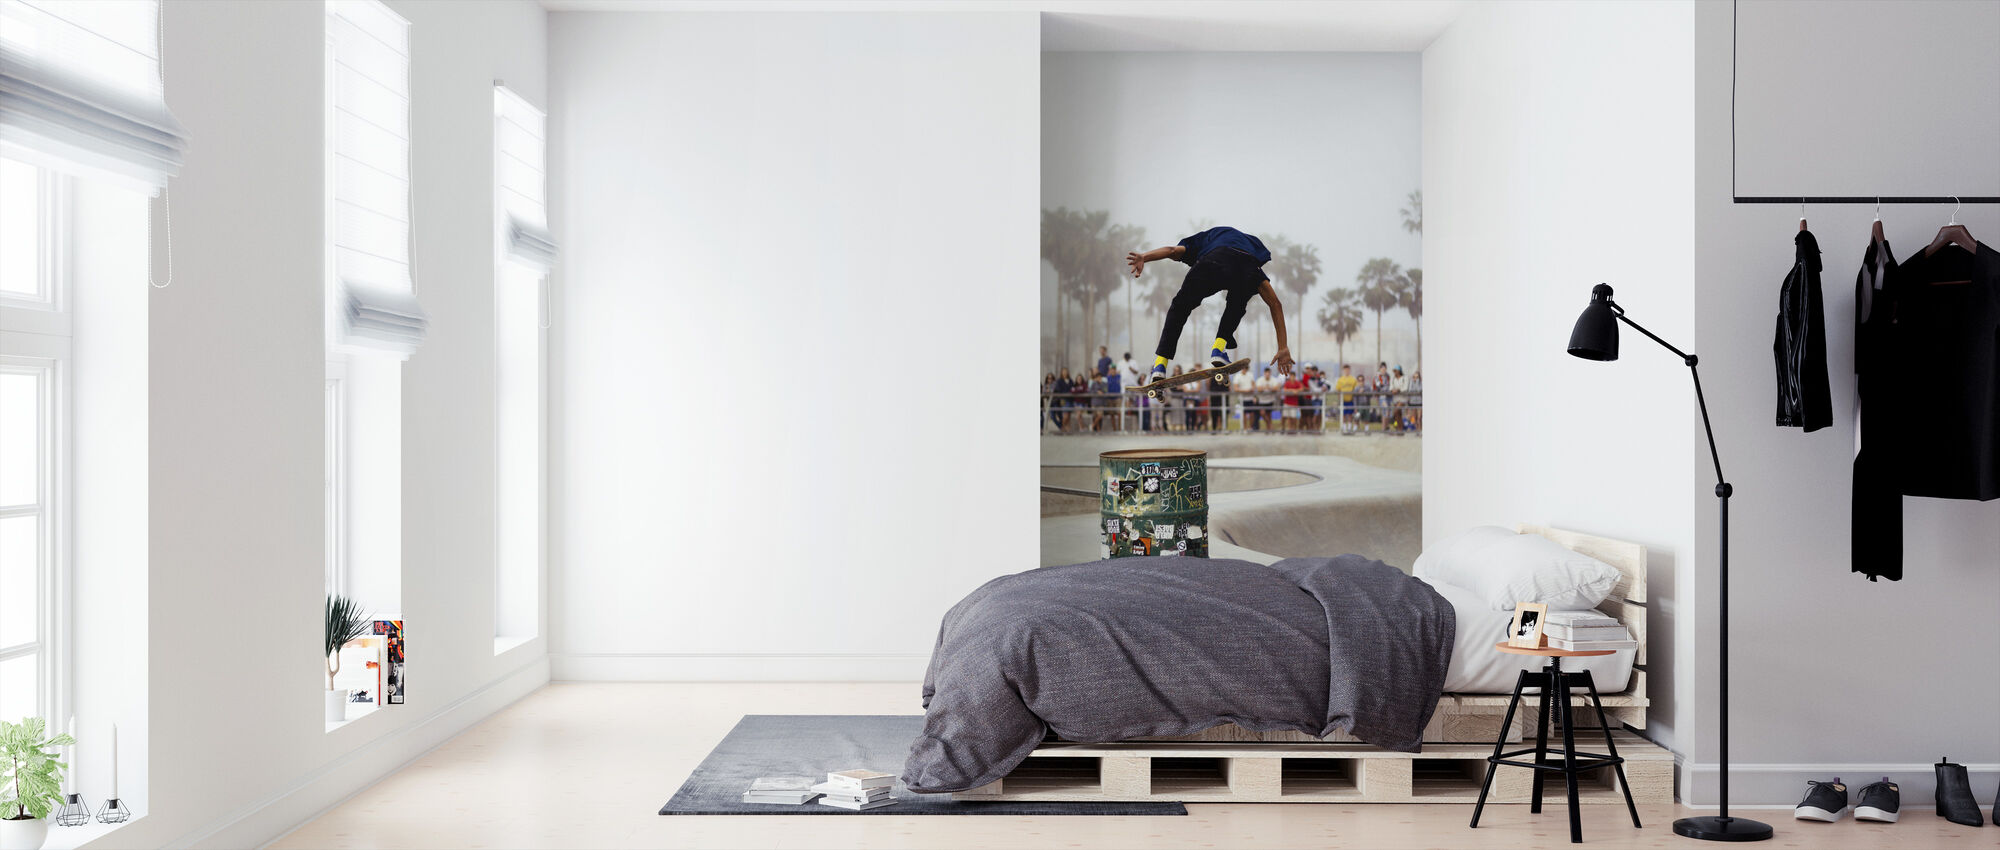 Skateboard Hangtime - Wallpaper - Bedroom